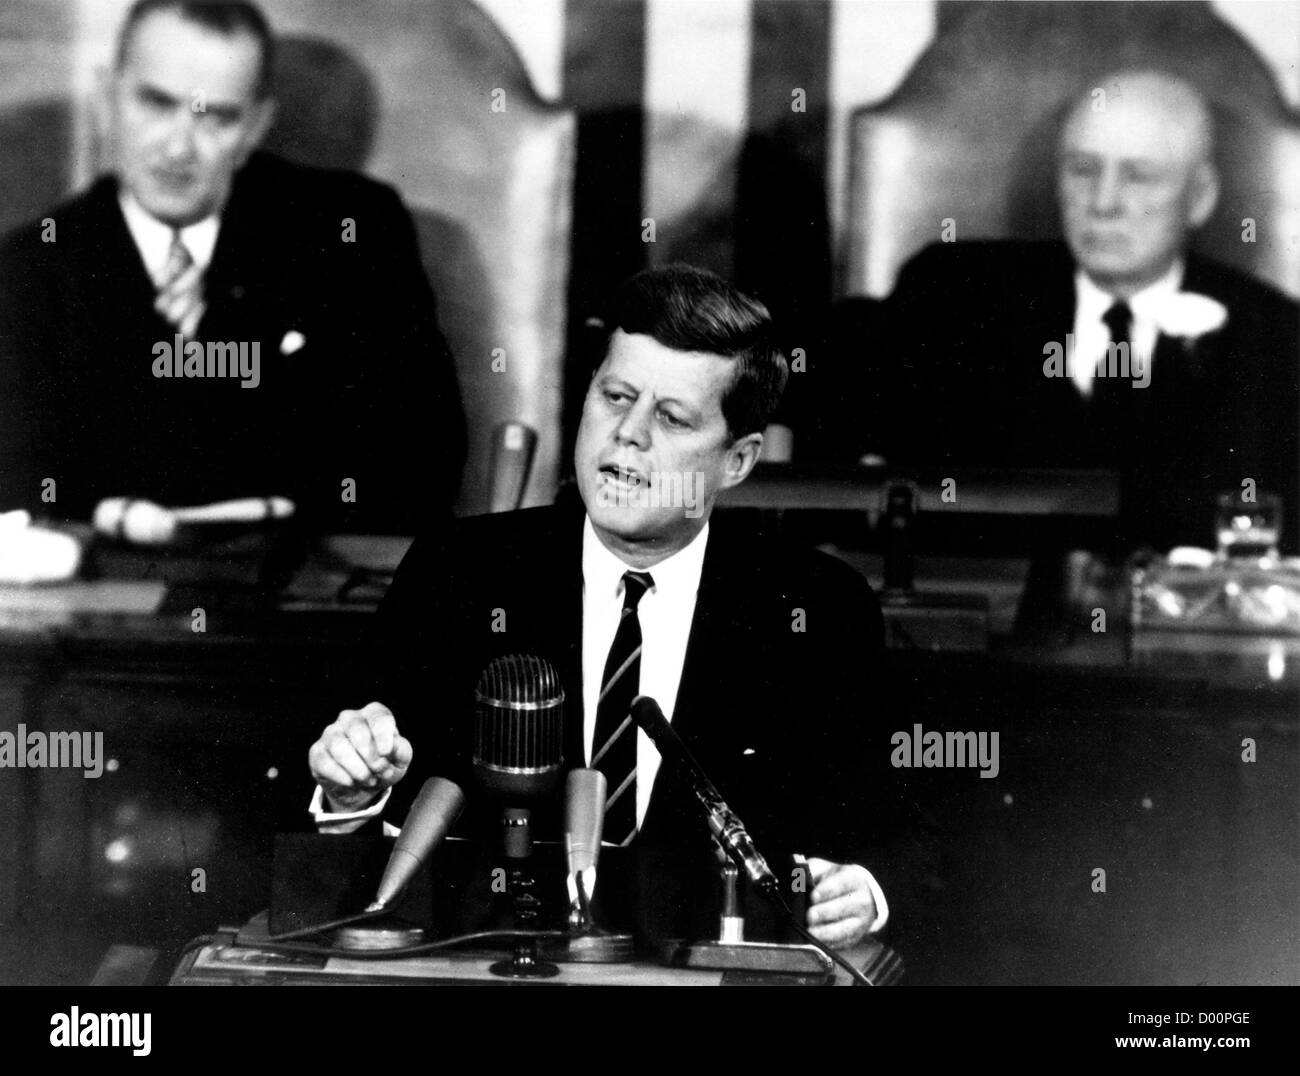 El Presidente John F. Kennedy dando discurso histórico Imagen De Stock